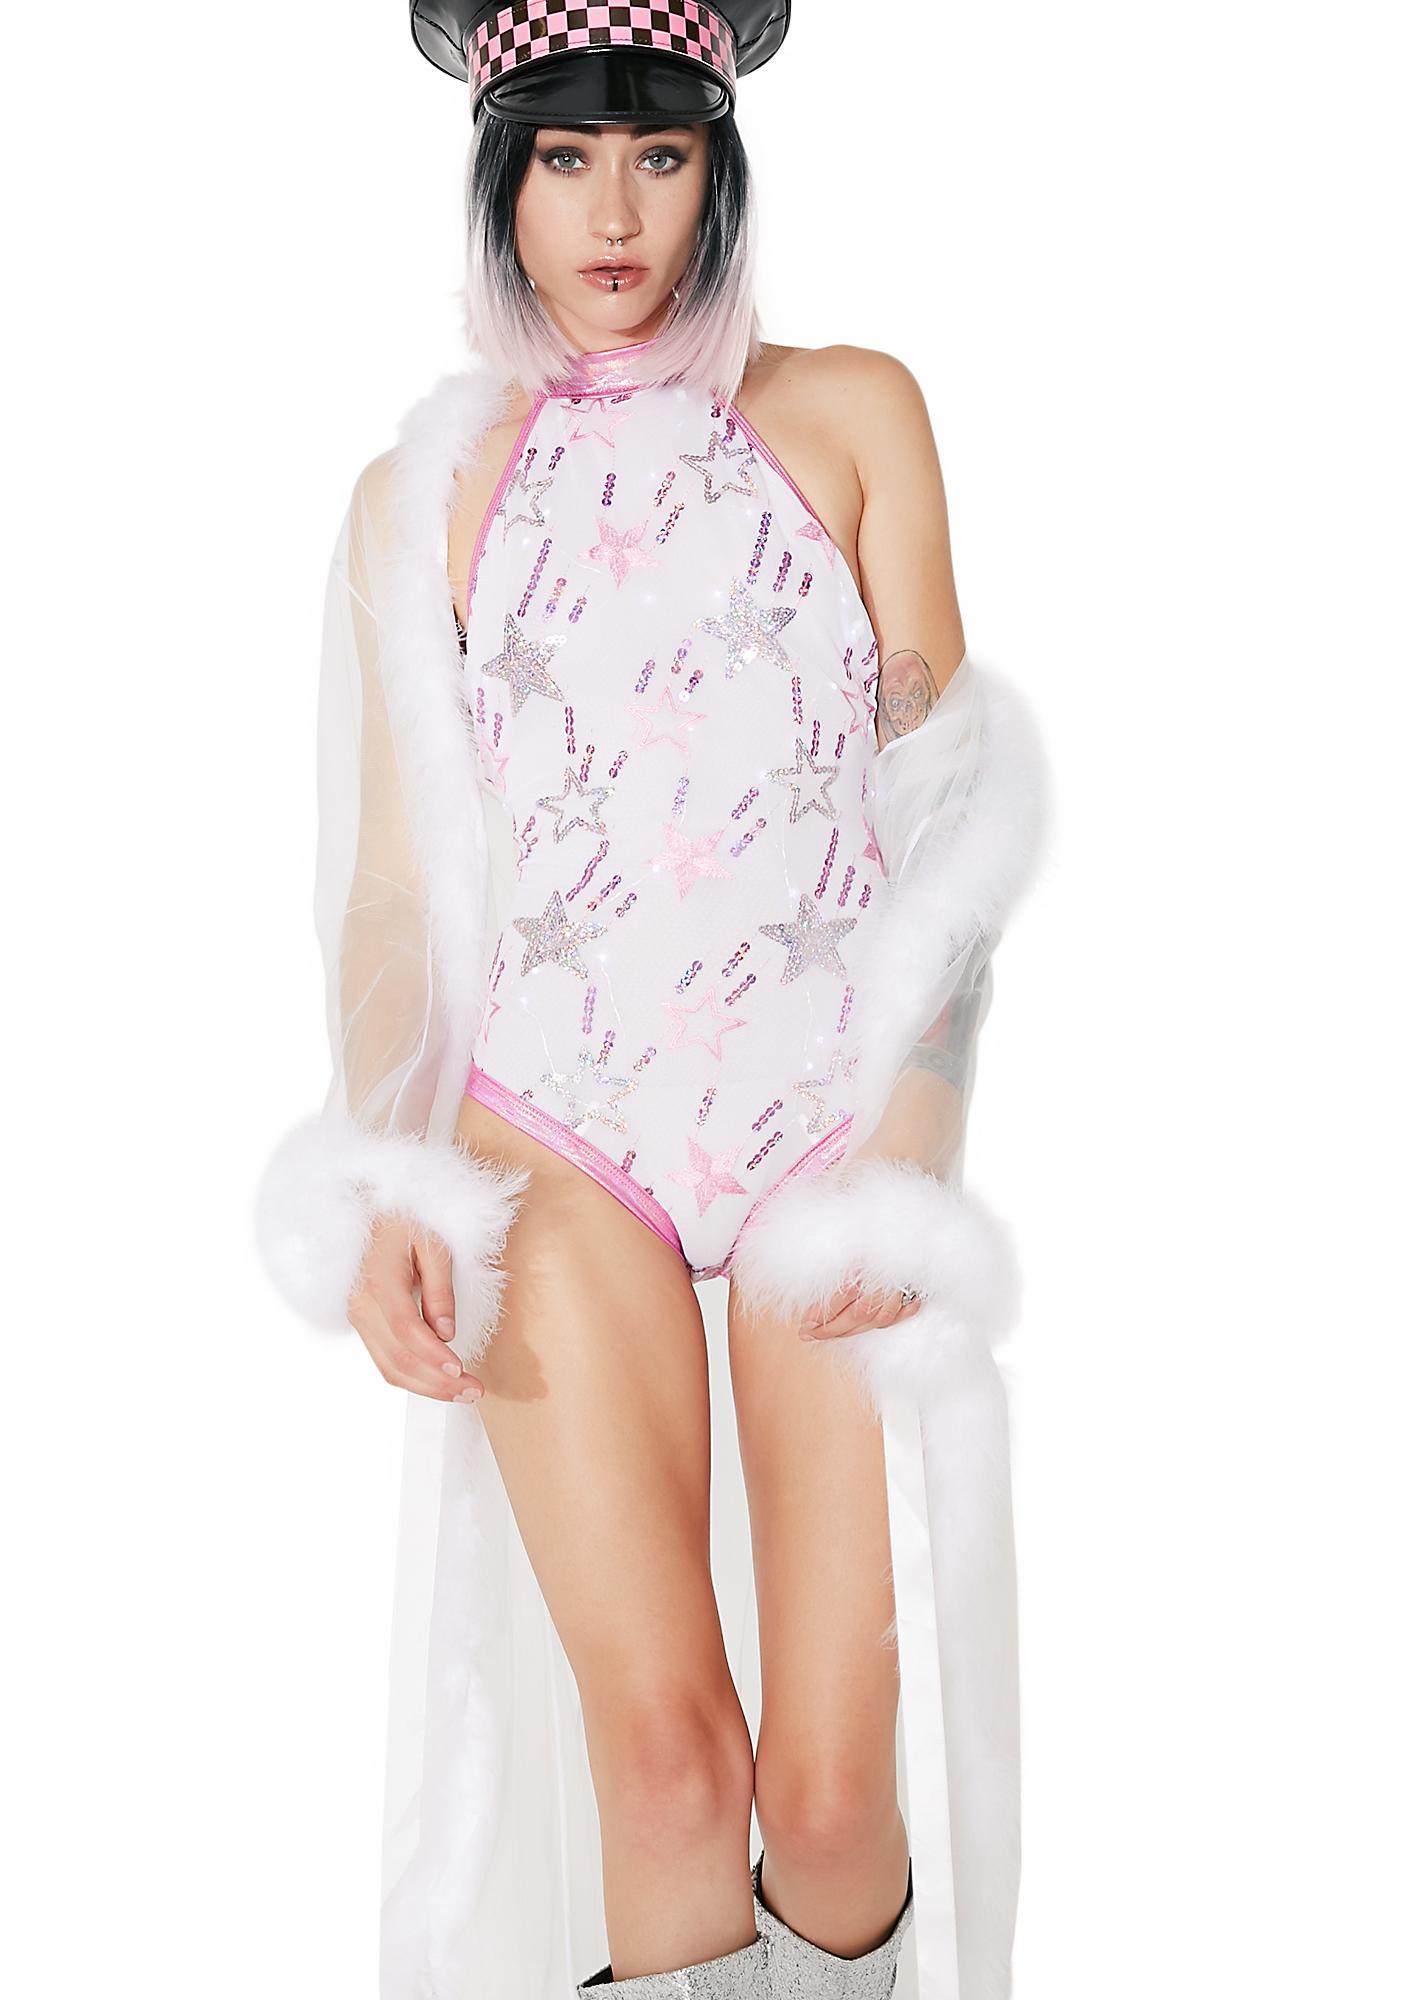 J Valentine Twinkle Light-Up Sequin Bodysuit